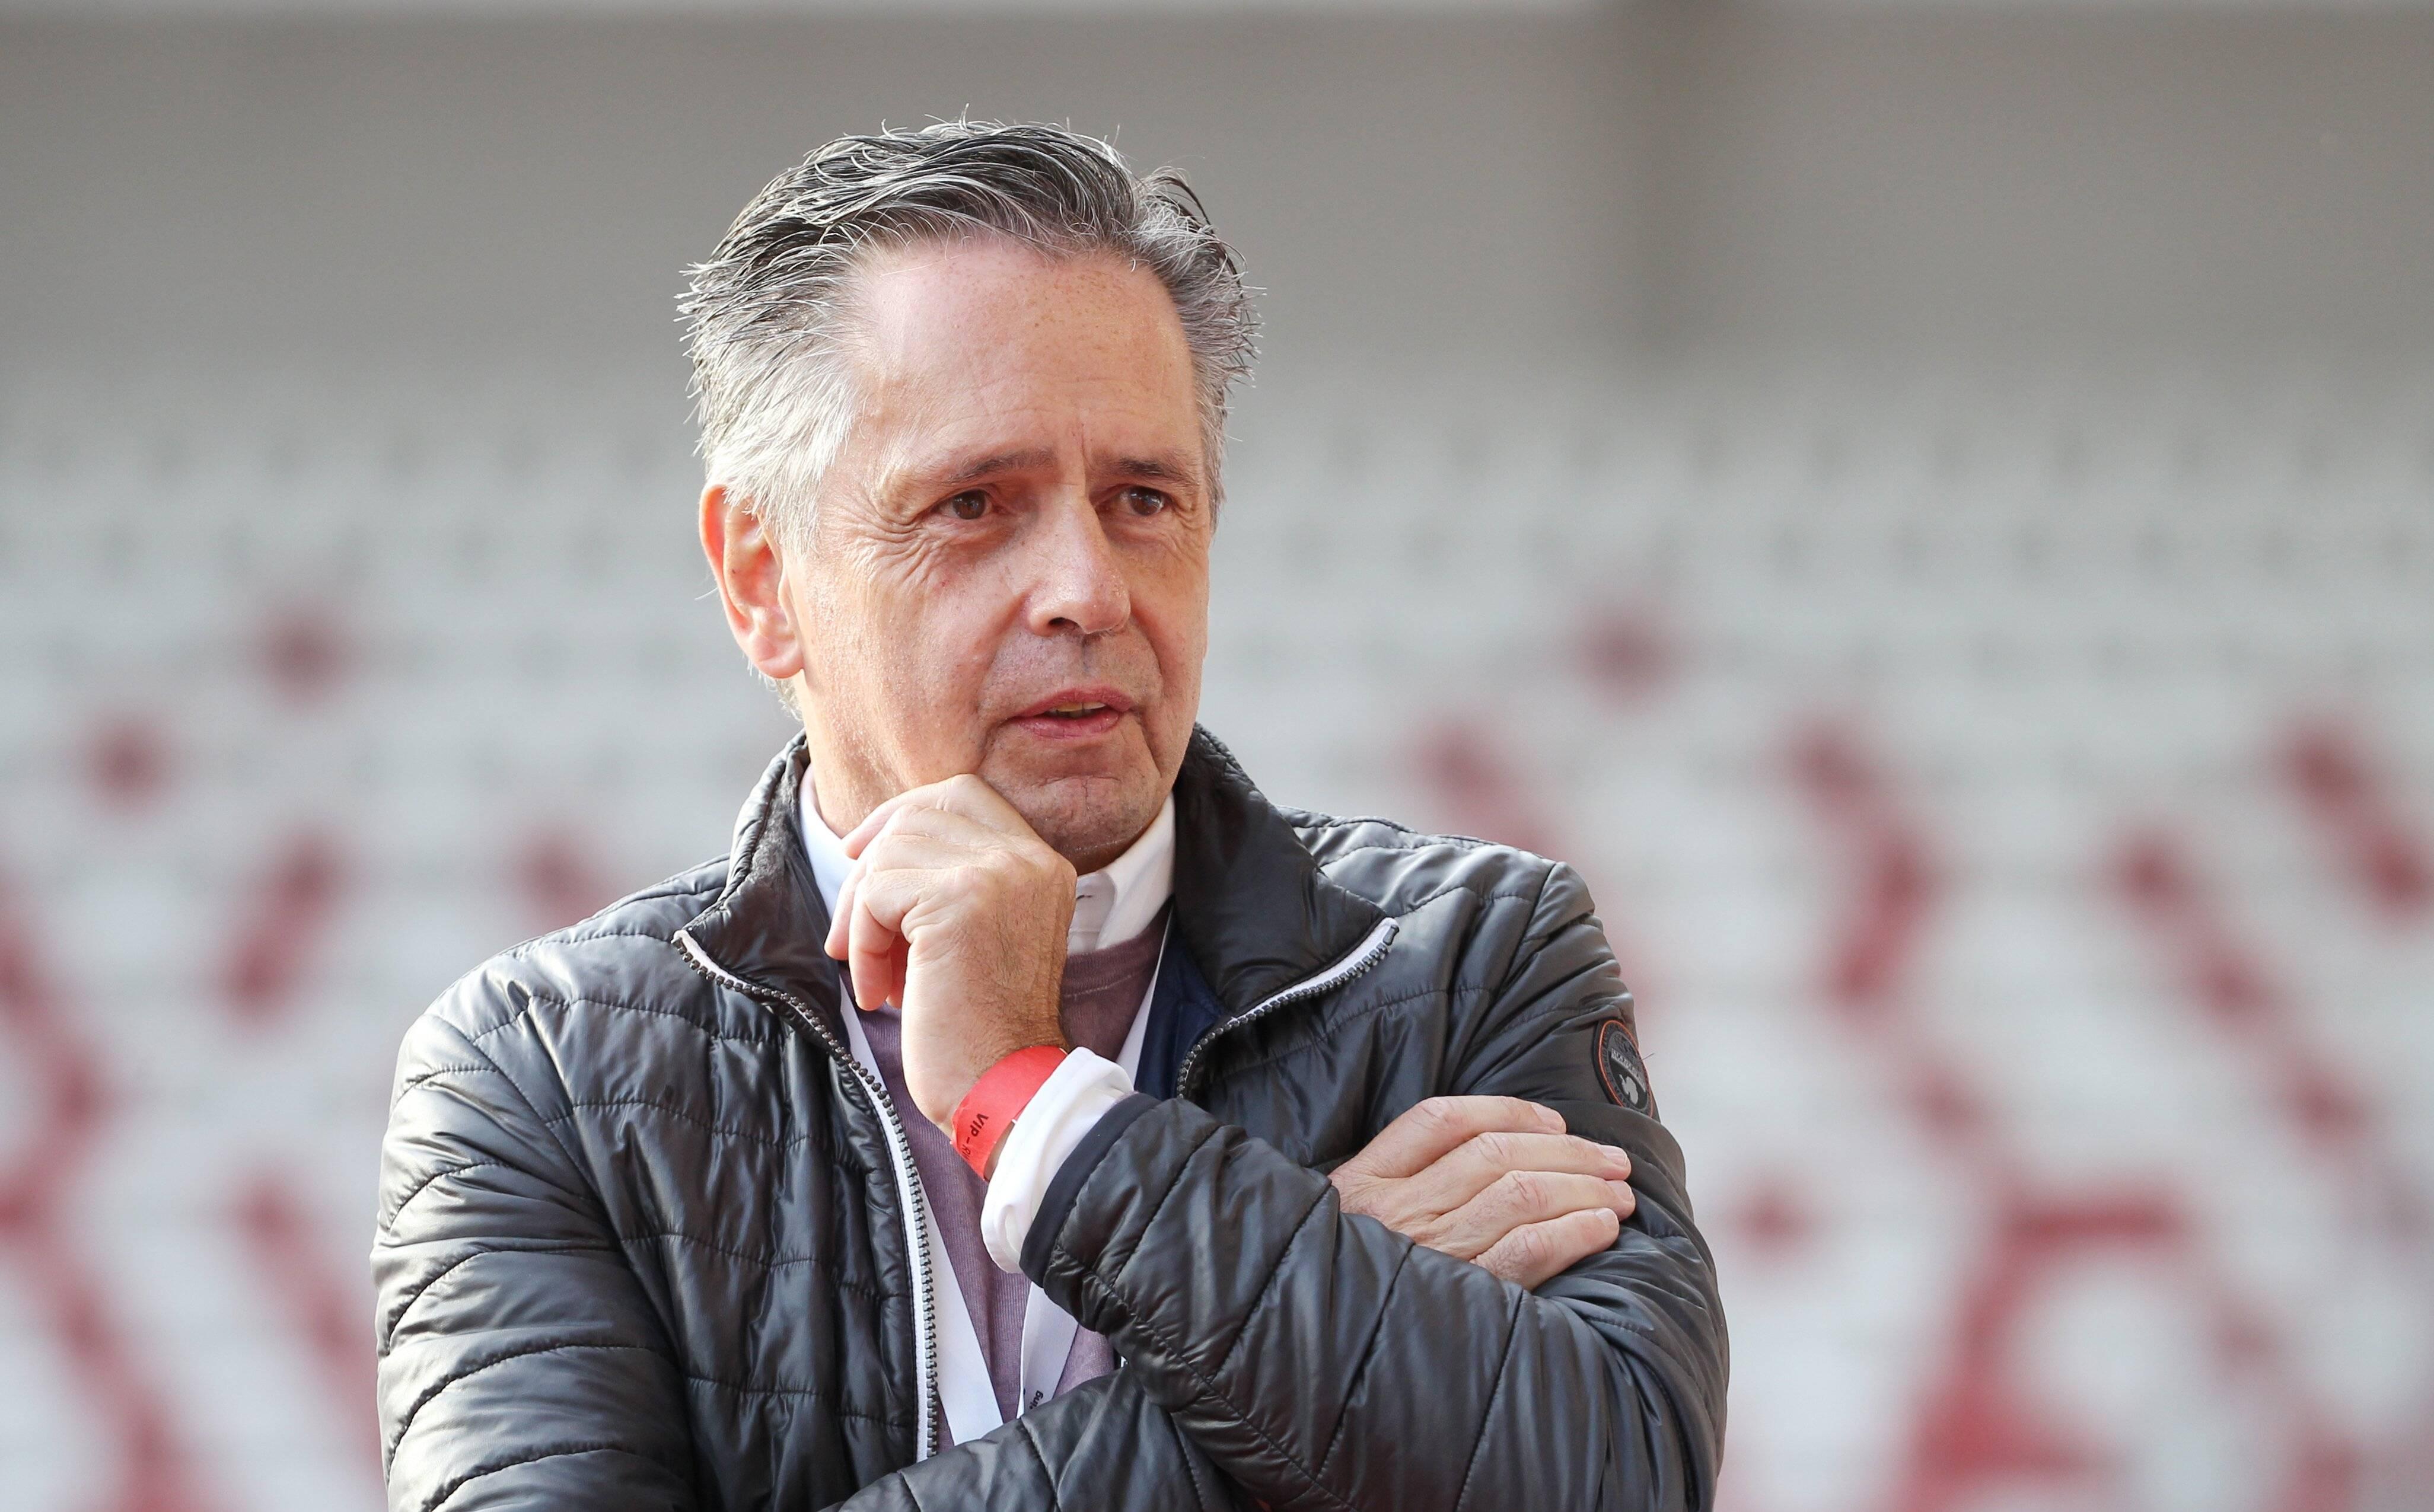 Rolf Rombach